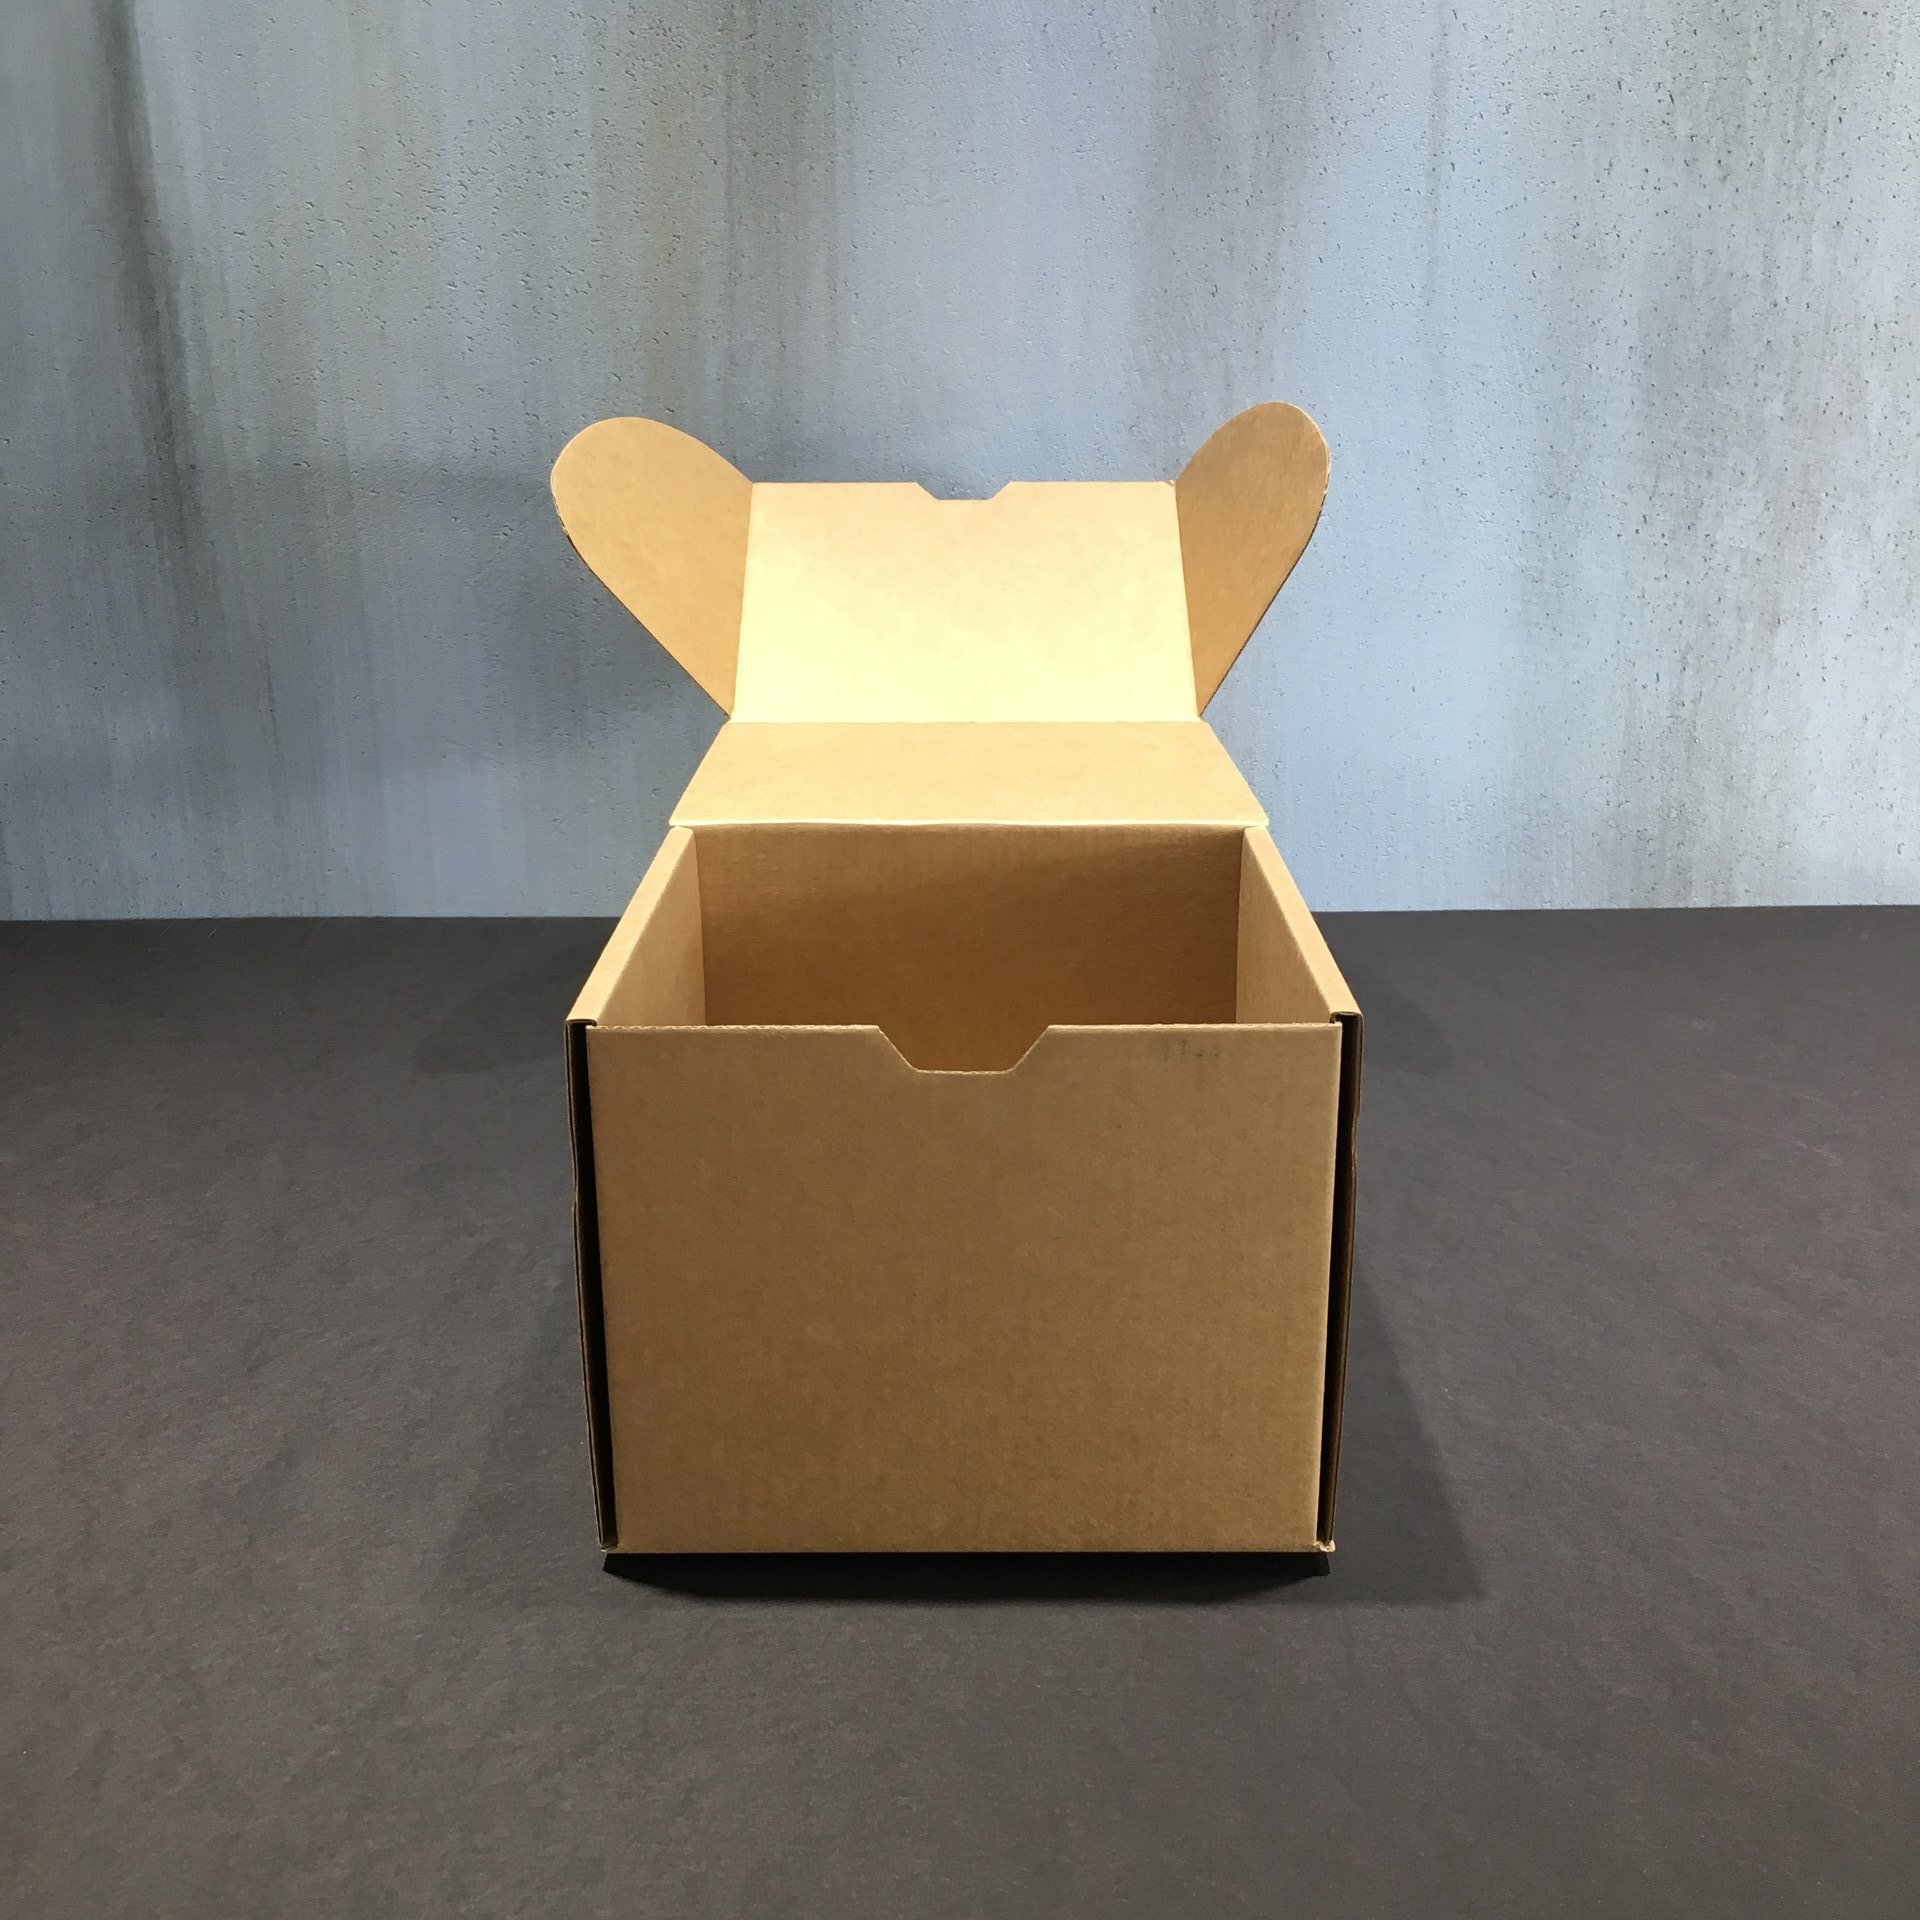 Кутия 150/155/125 мм